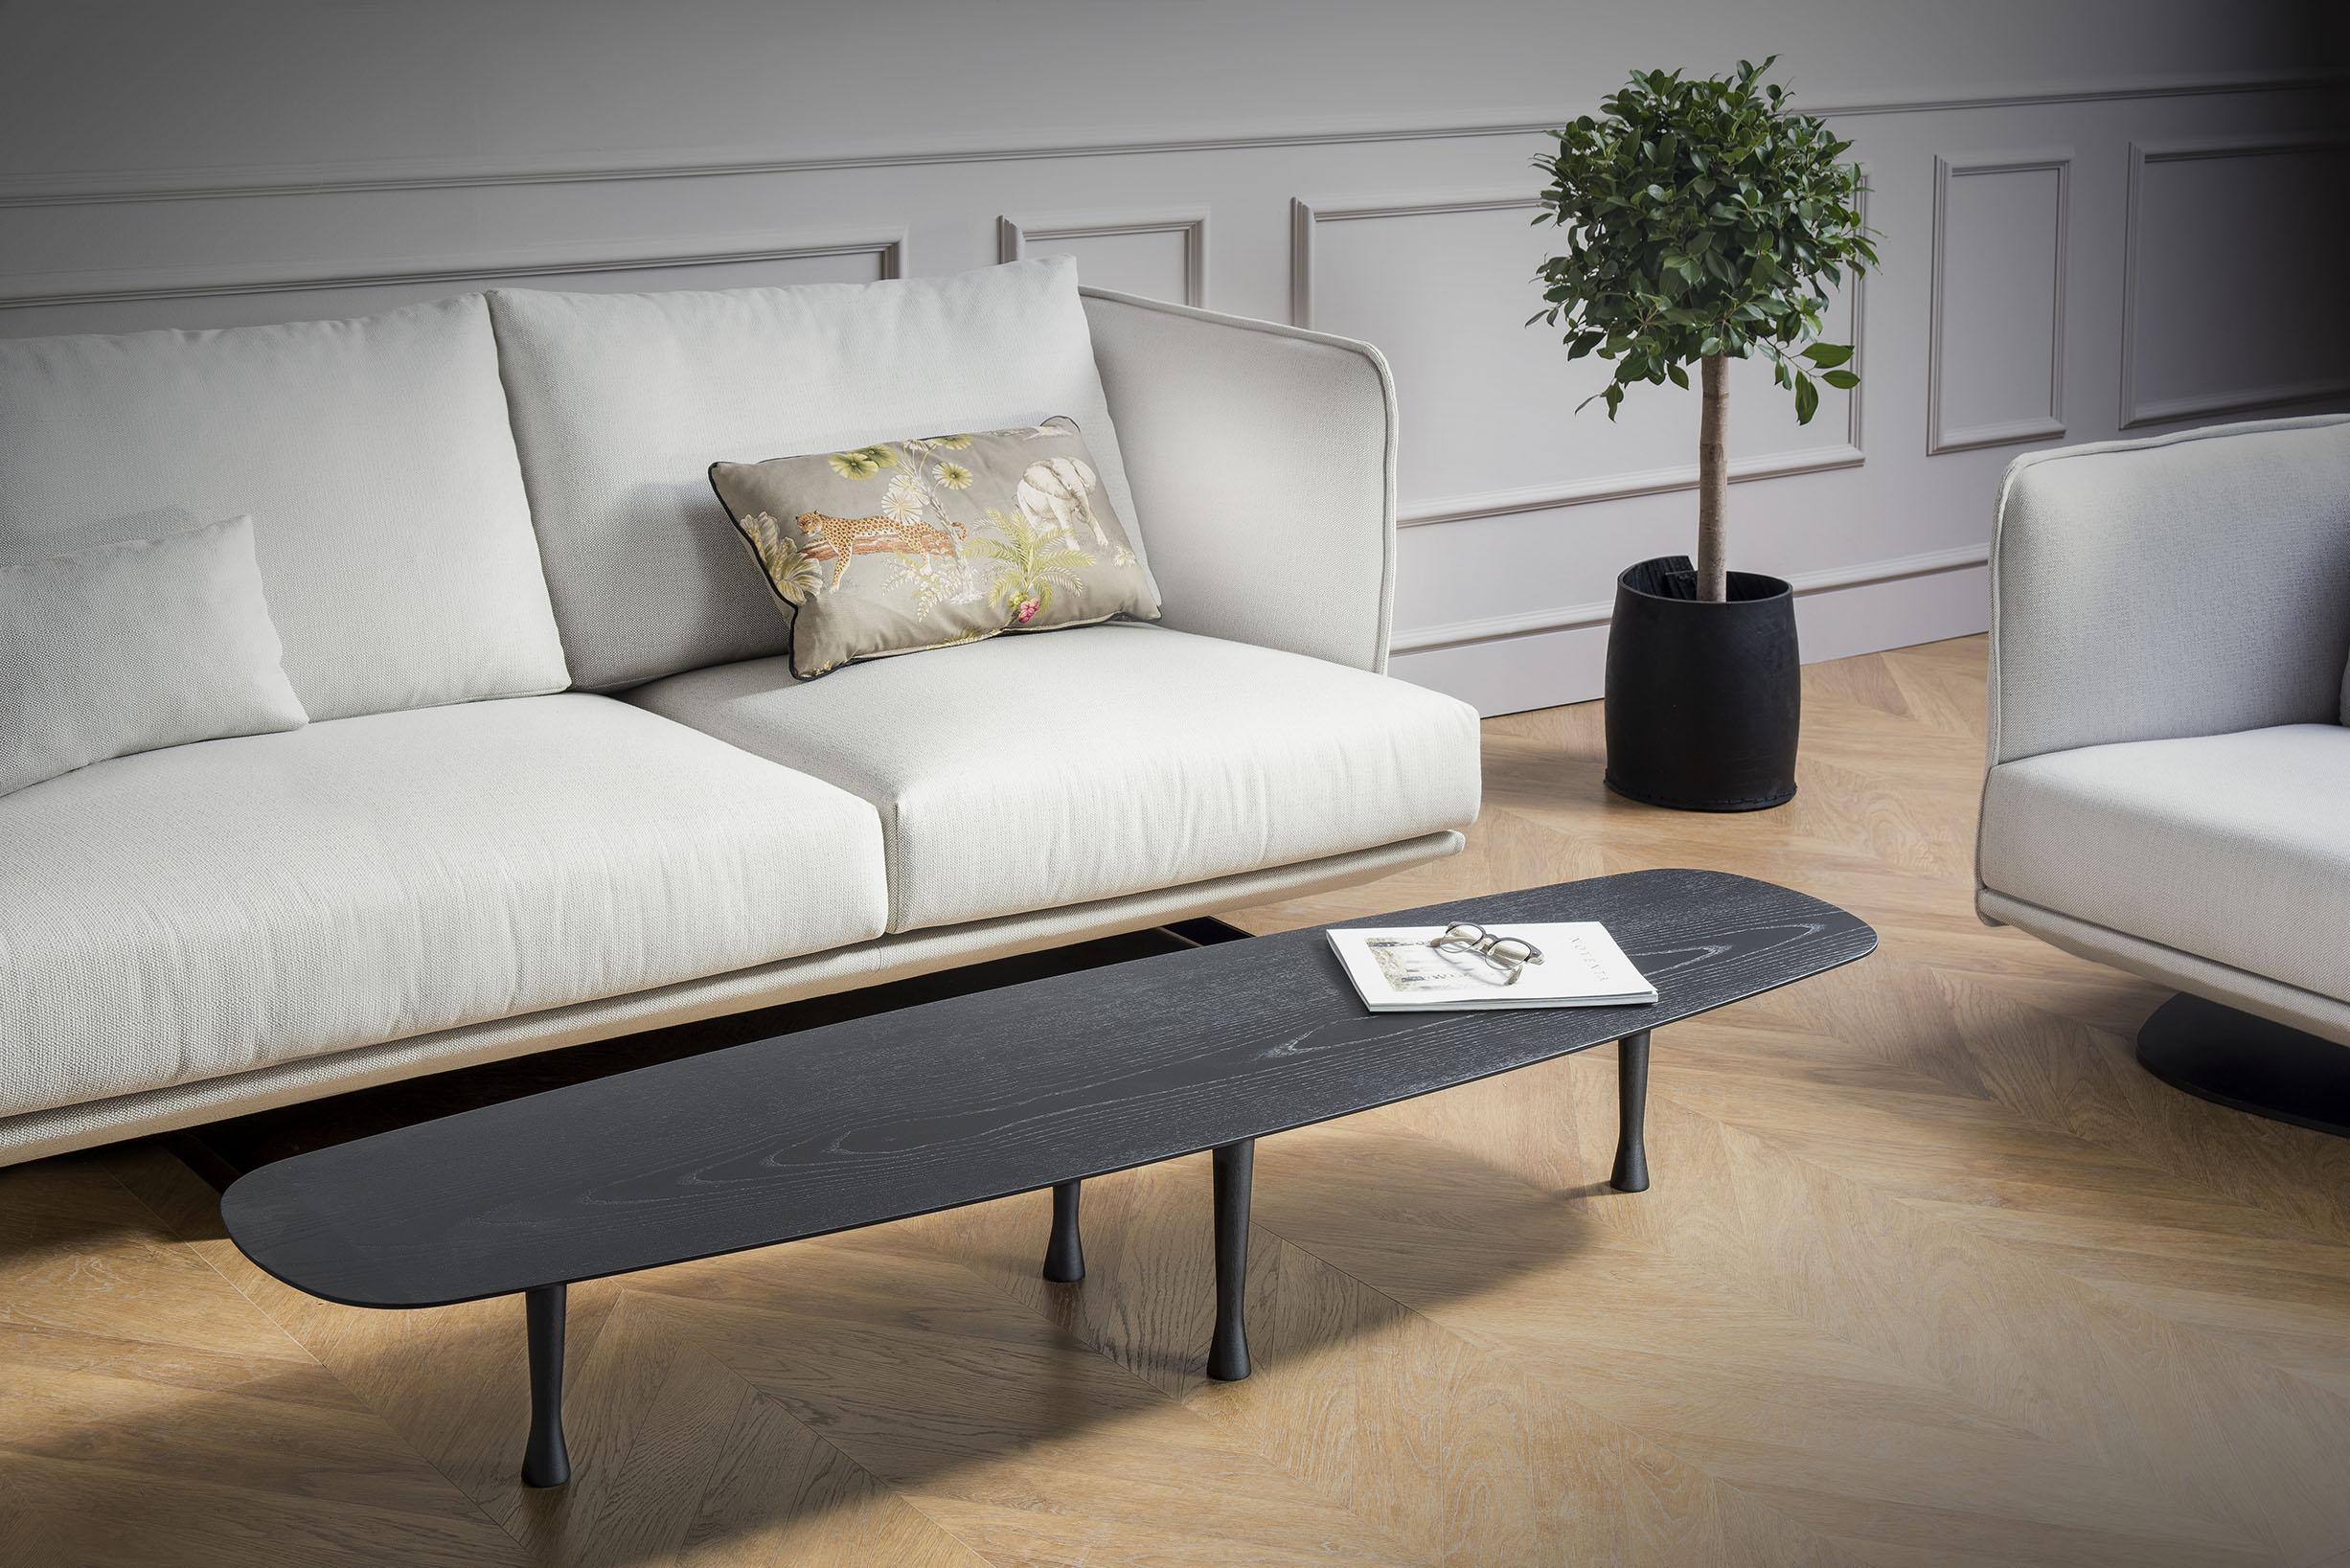 black-table-sofa-plant-magazine